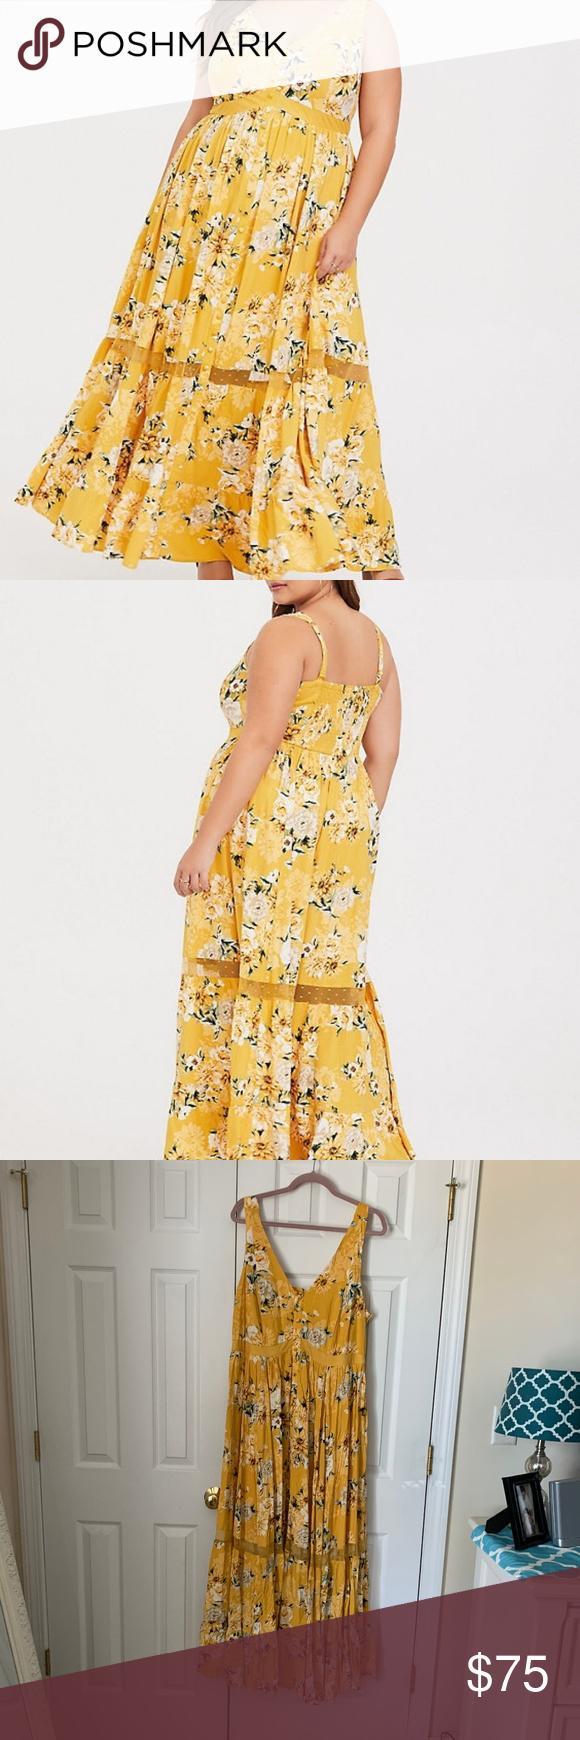 Torrid Yellow Floral Challis Maxi Dress 2 2x Yellow Floral Maxi Dress Floral Maxi Dress Dresses [ 1740 x 580 Pixel ]